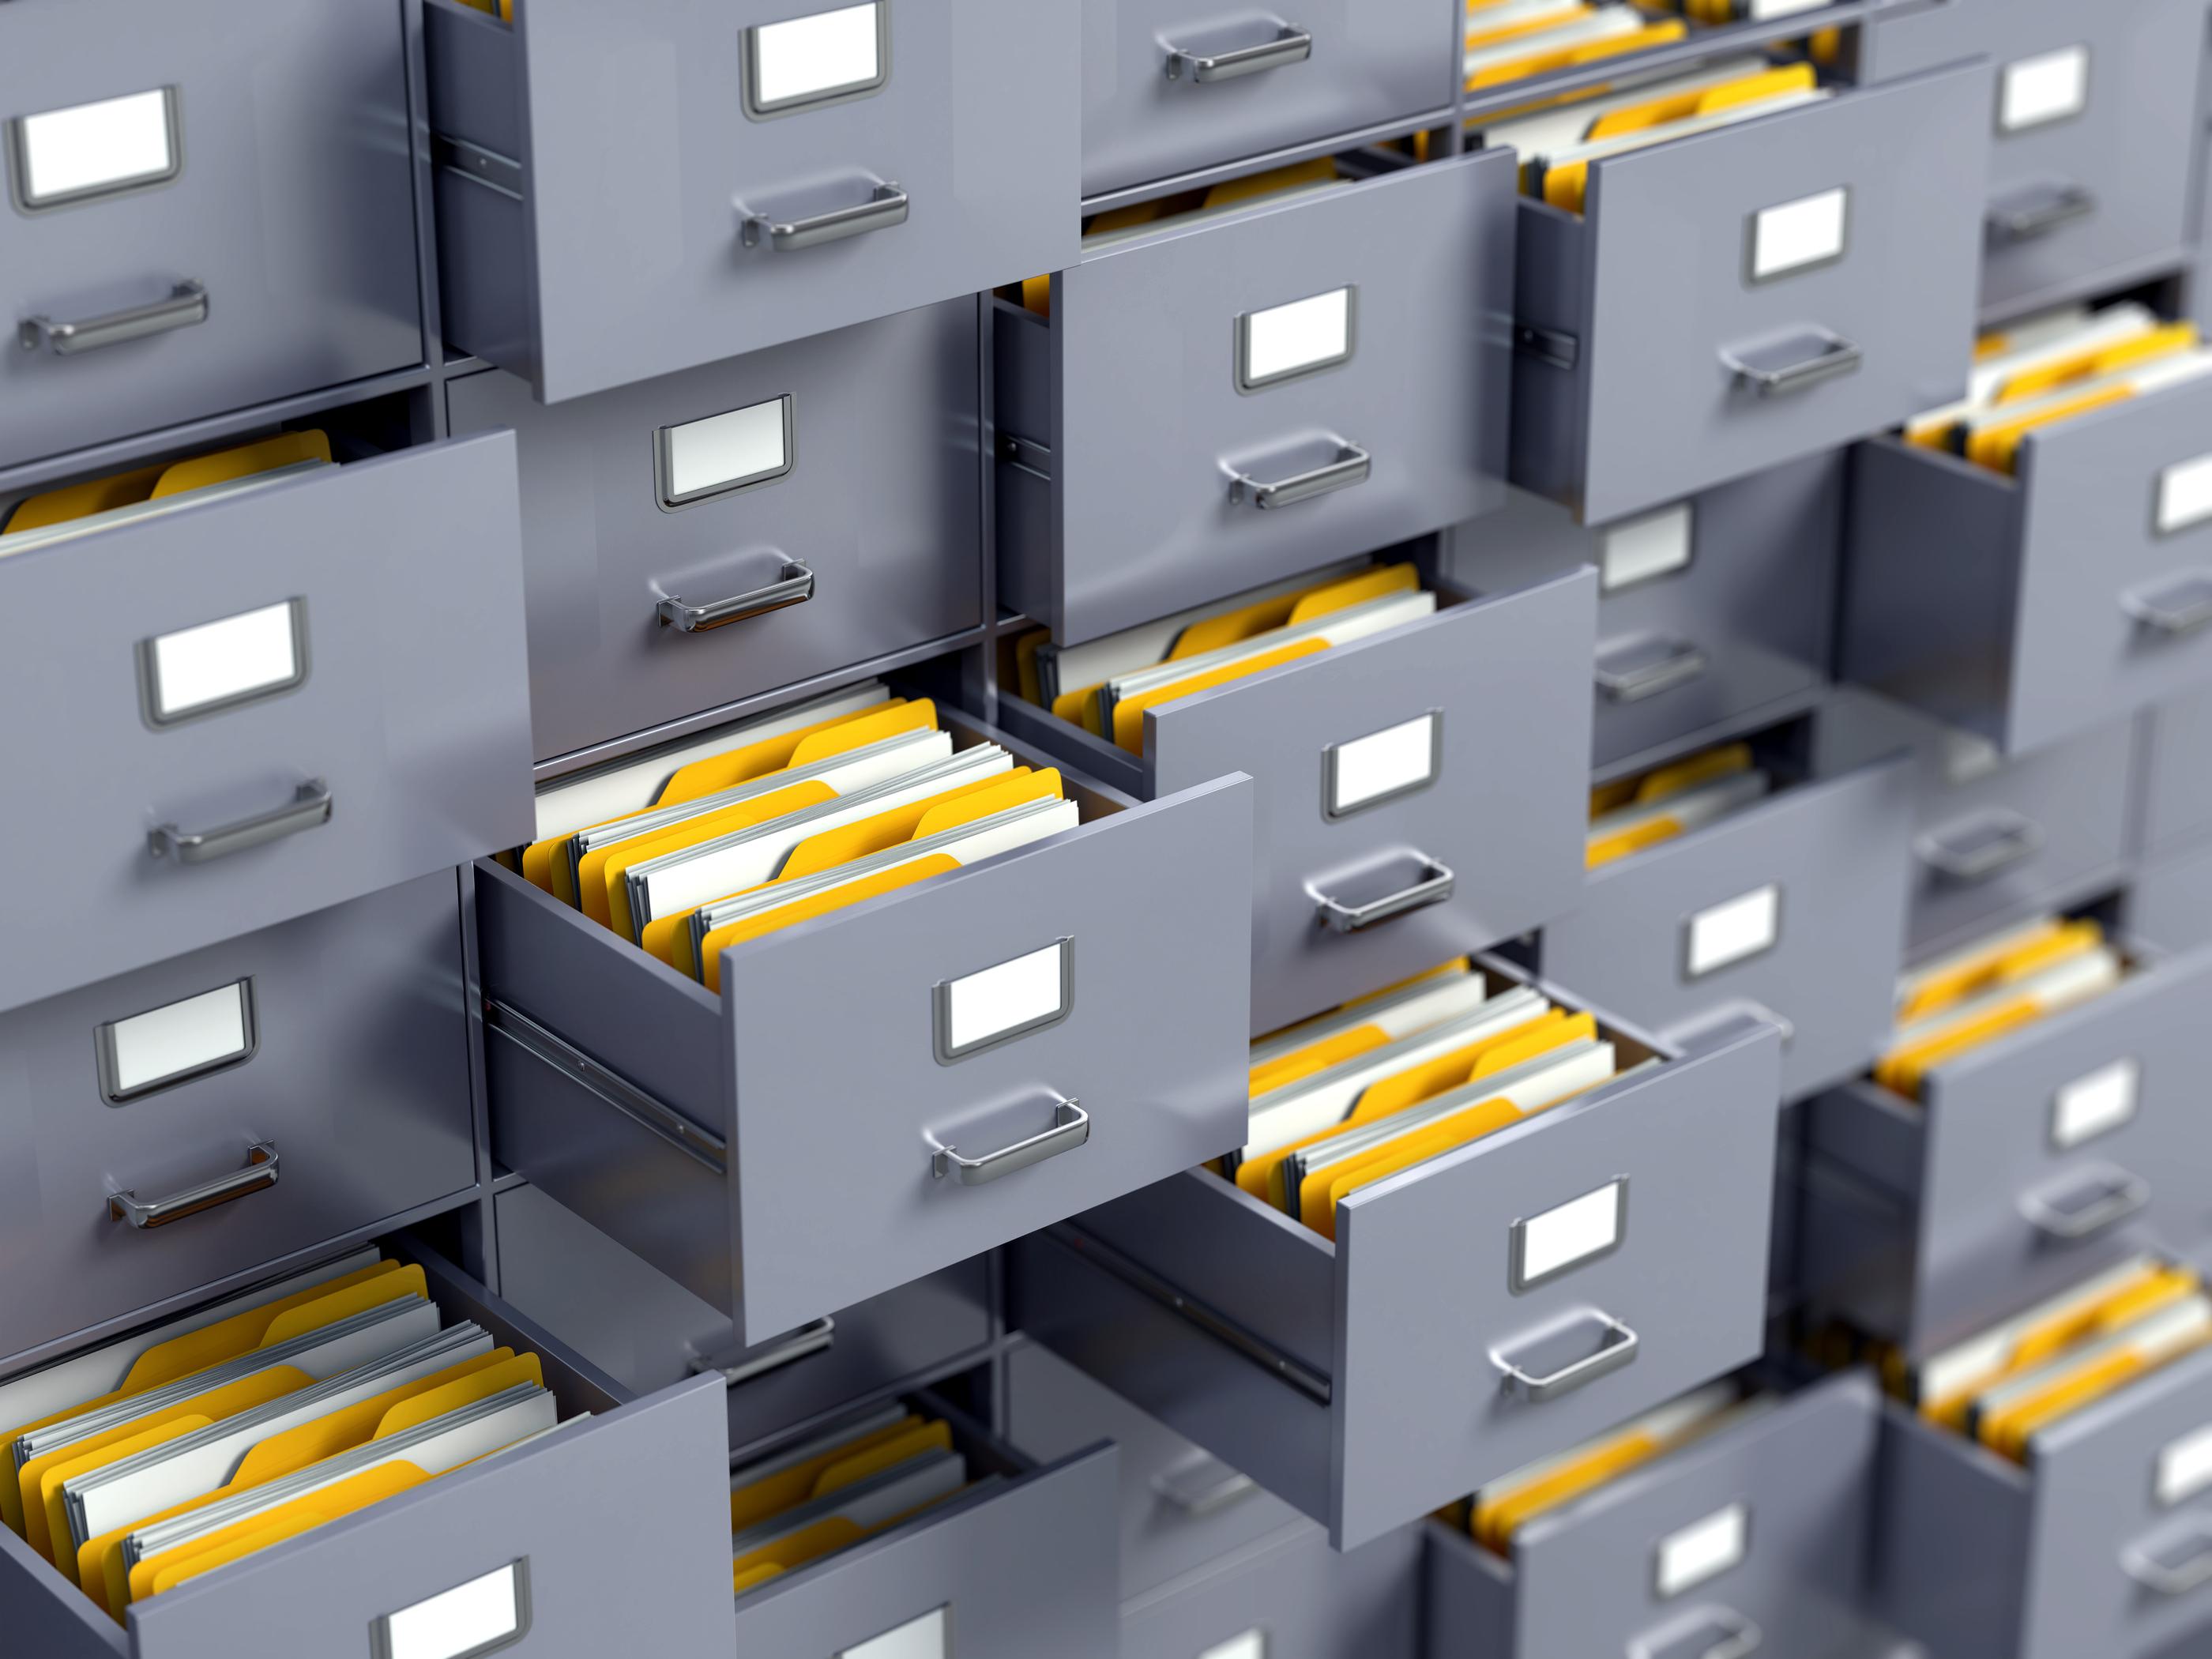 Storage Shelves- Cost-efficient Storage Solutions